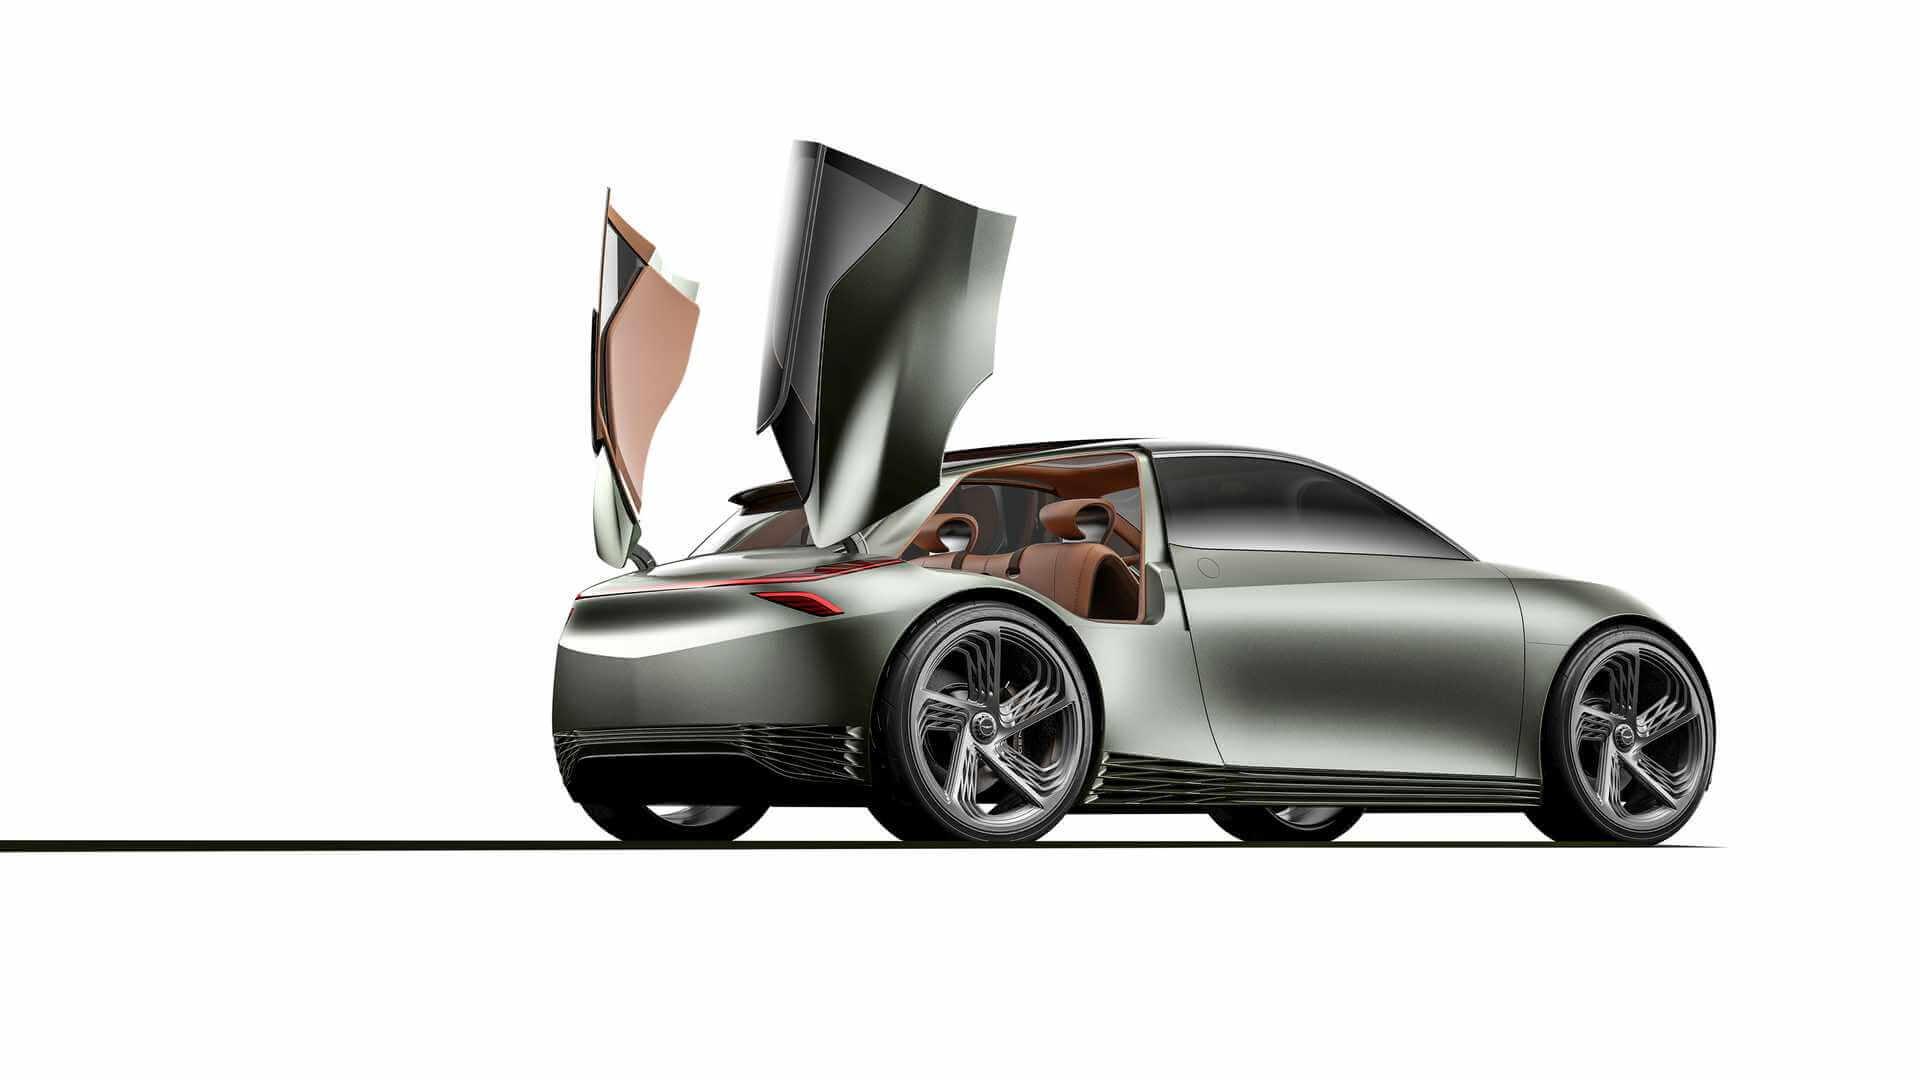 Концепт городского электромобиля Genesis Mint